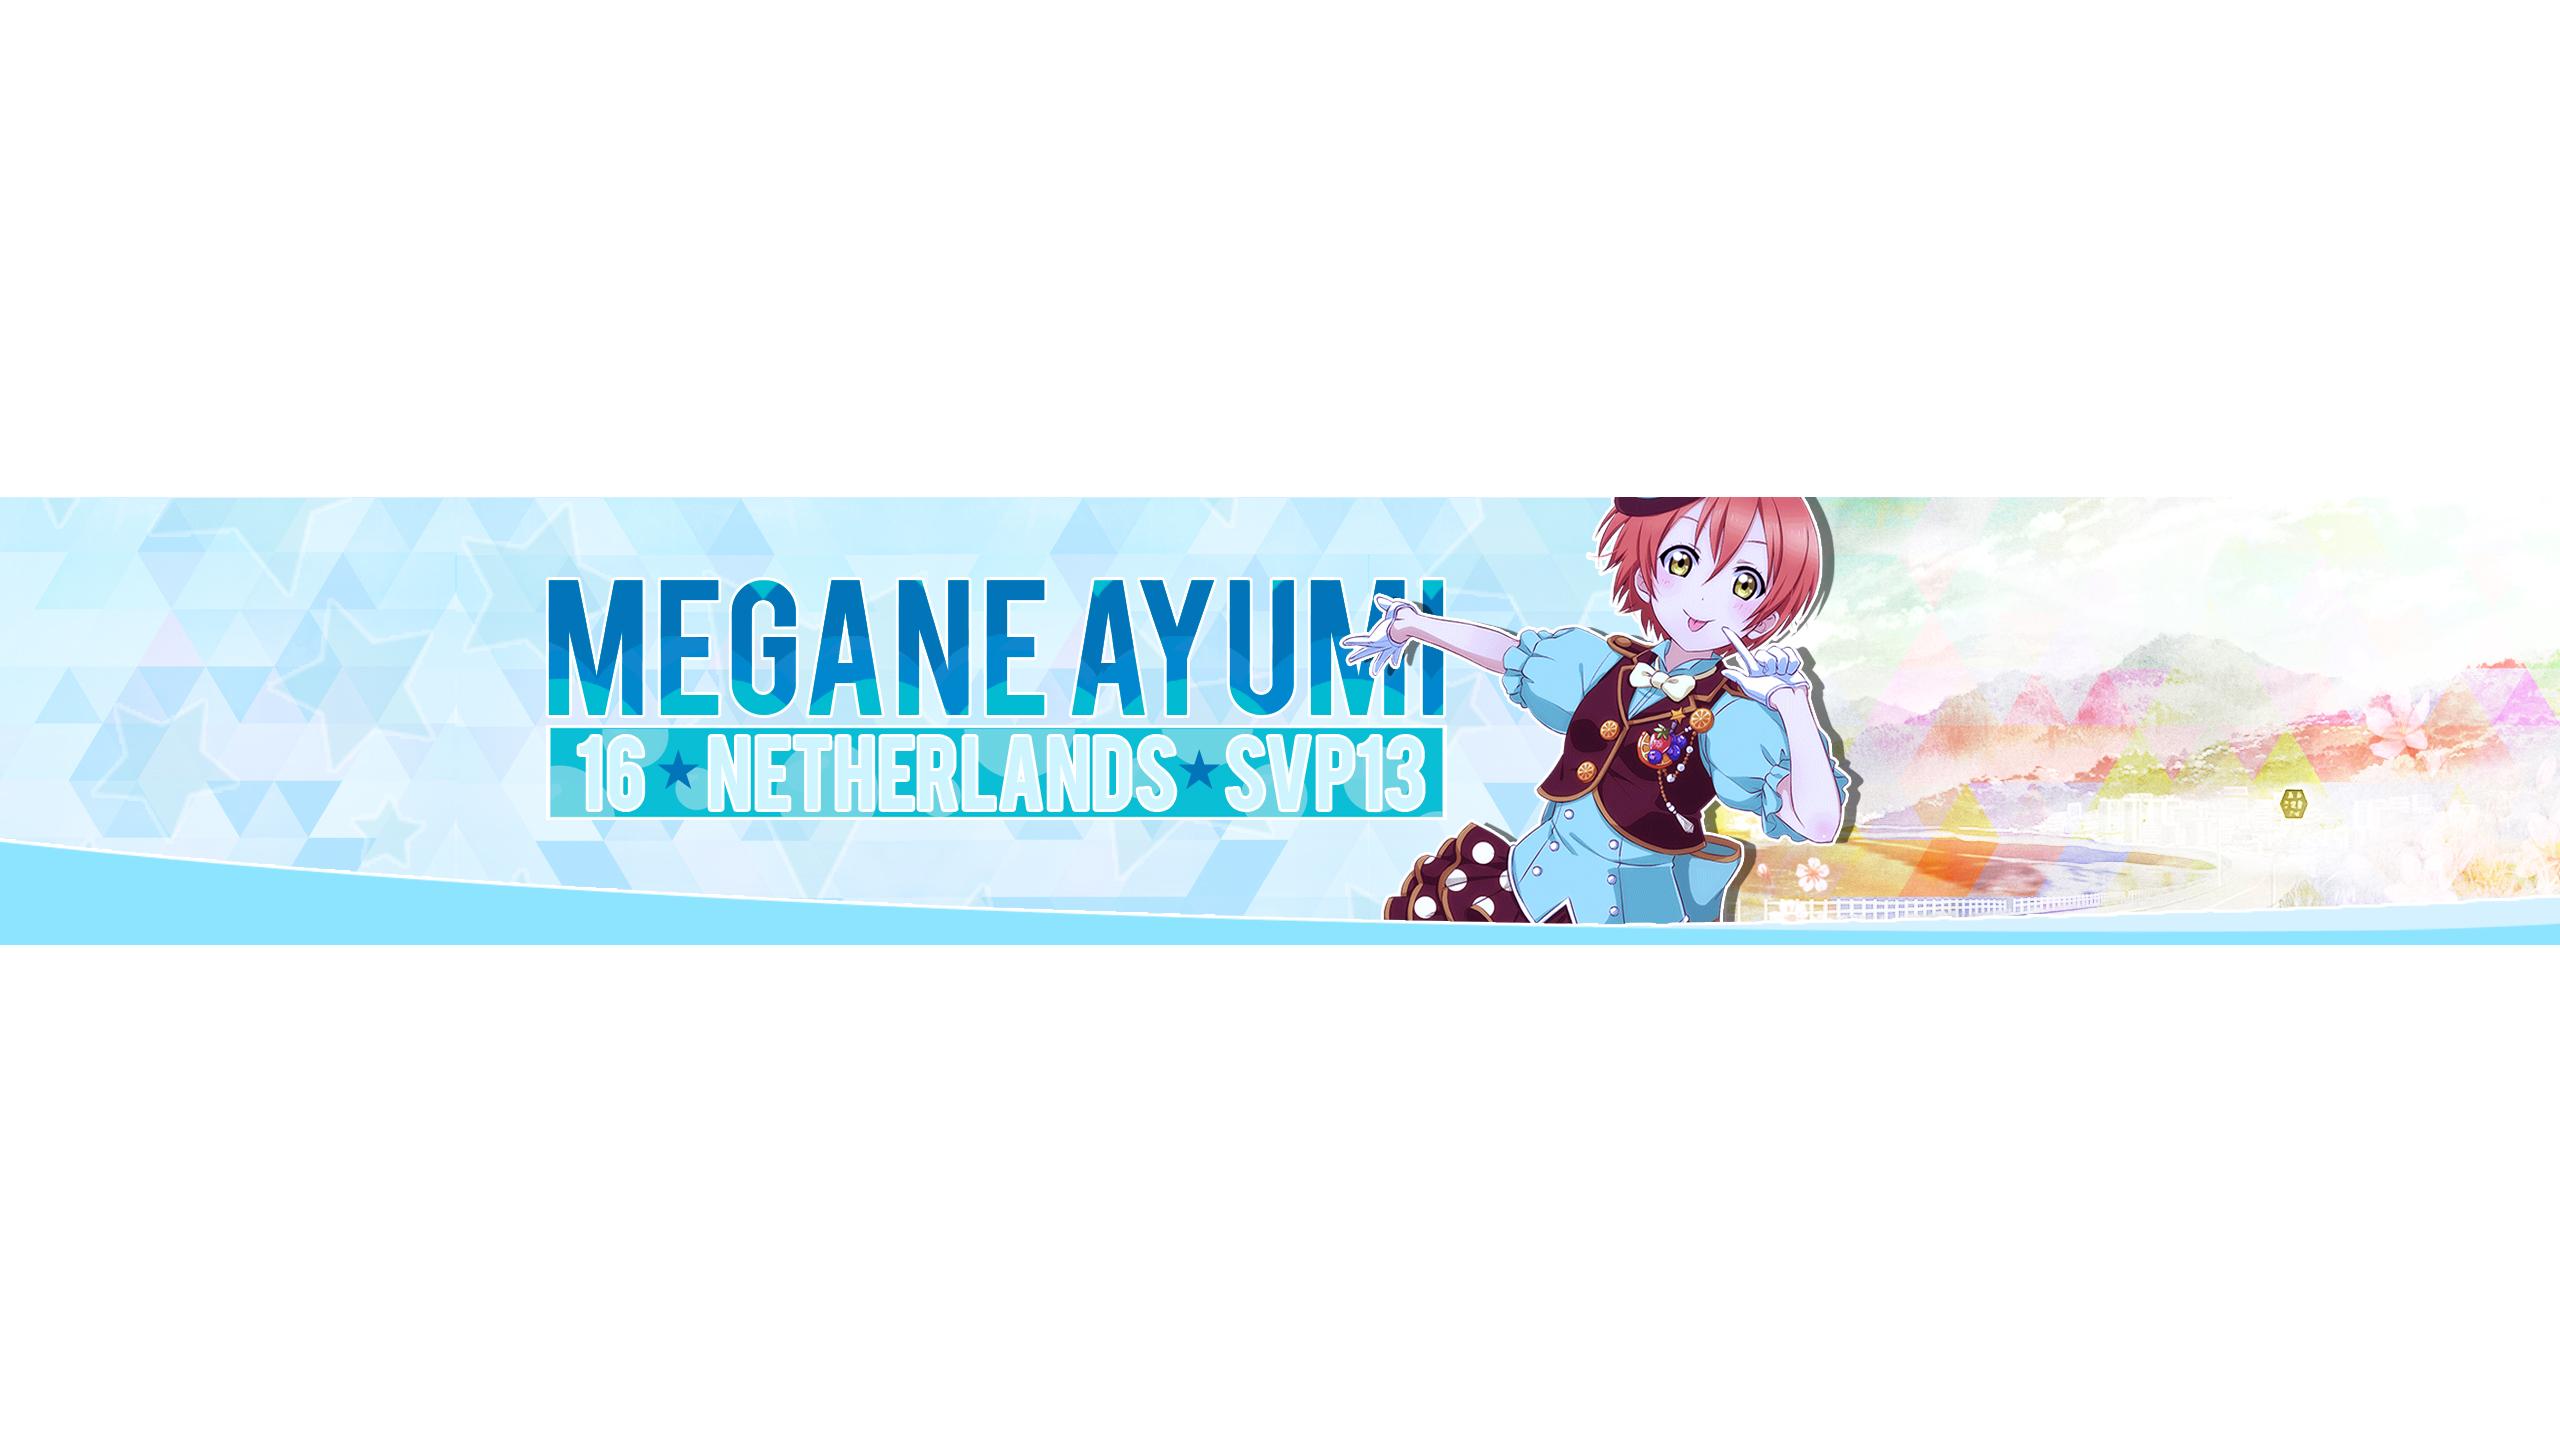 Rin banner by MeganeAyumii